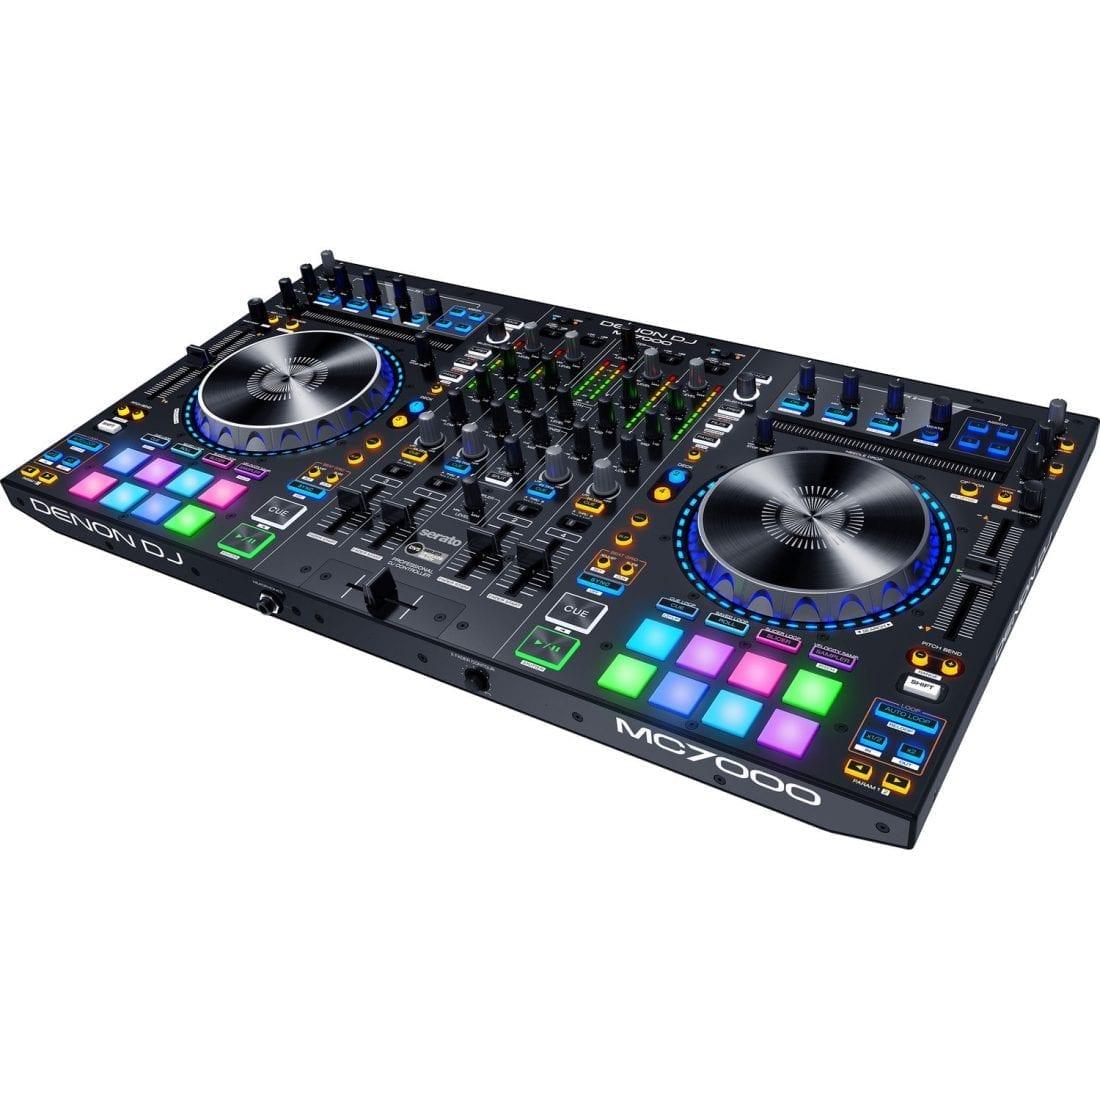 Denon DJ MC7000 | Premium 4-Channel DJ Controller & Mixer with Dual USB  Audio Interfaces and full Serato DJ download